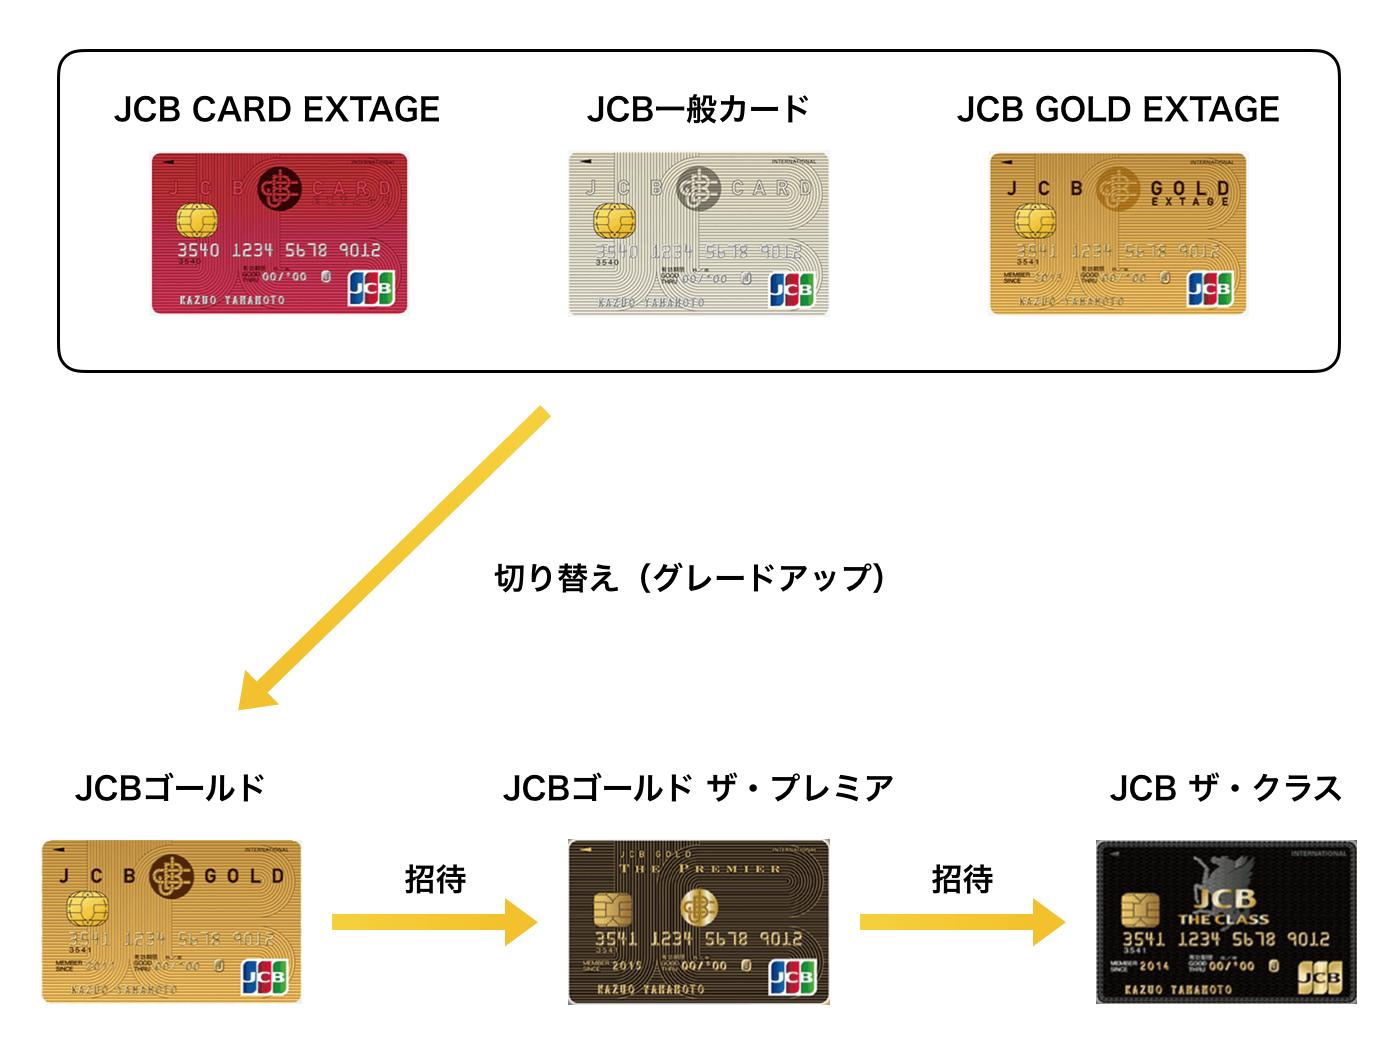 JCB一般カード プロパーカード ザ・クラス